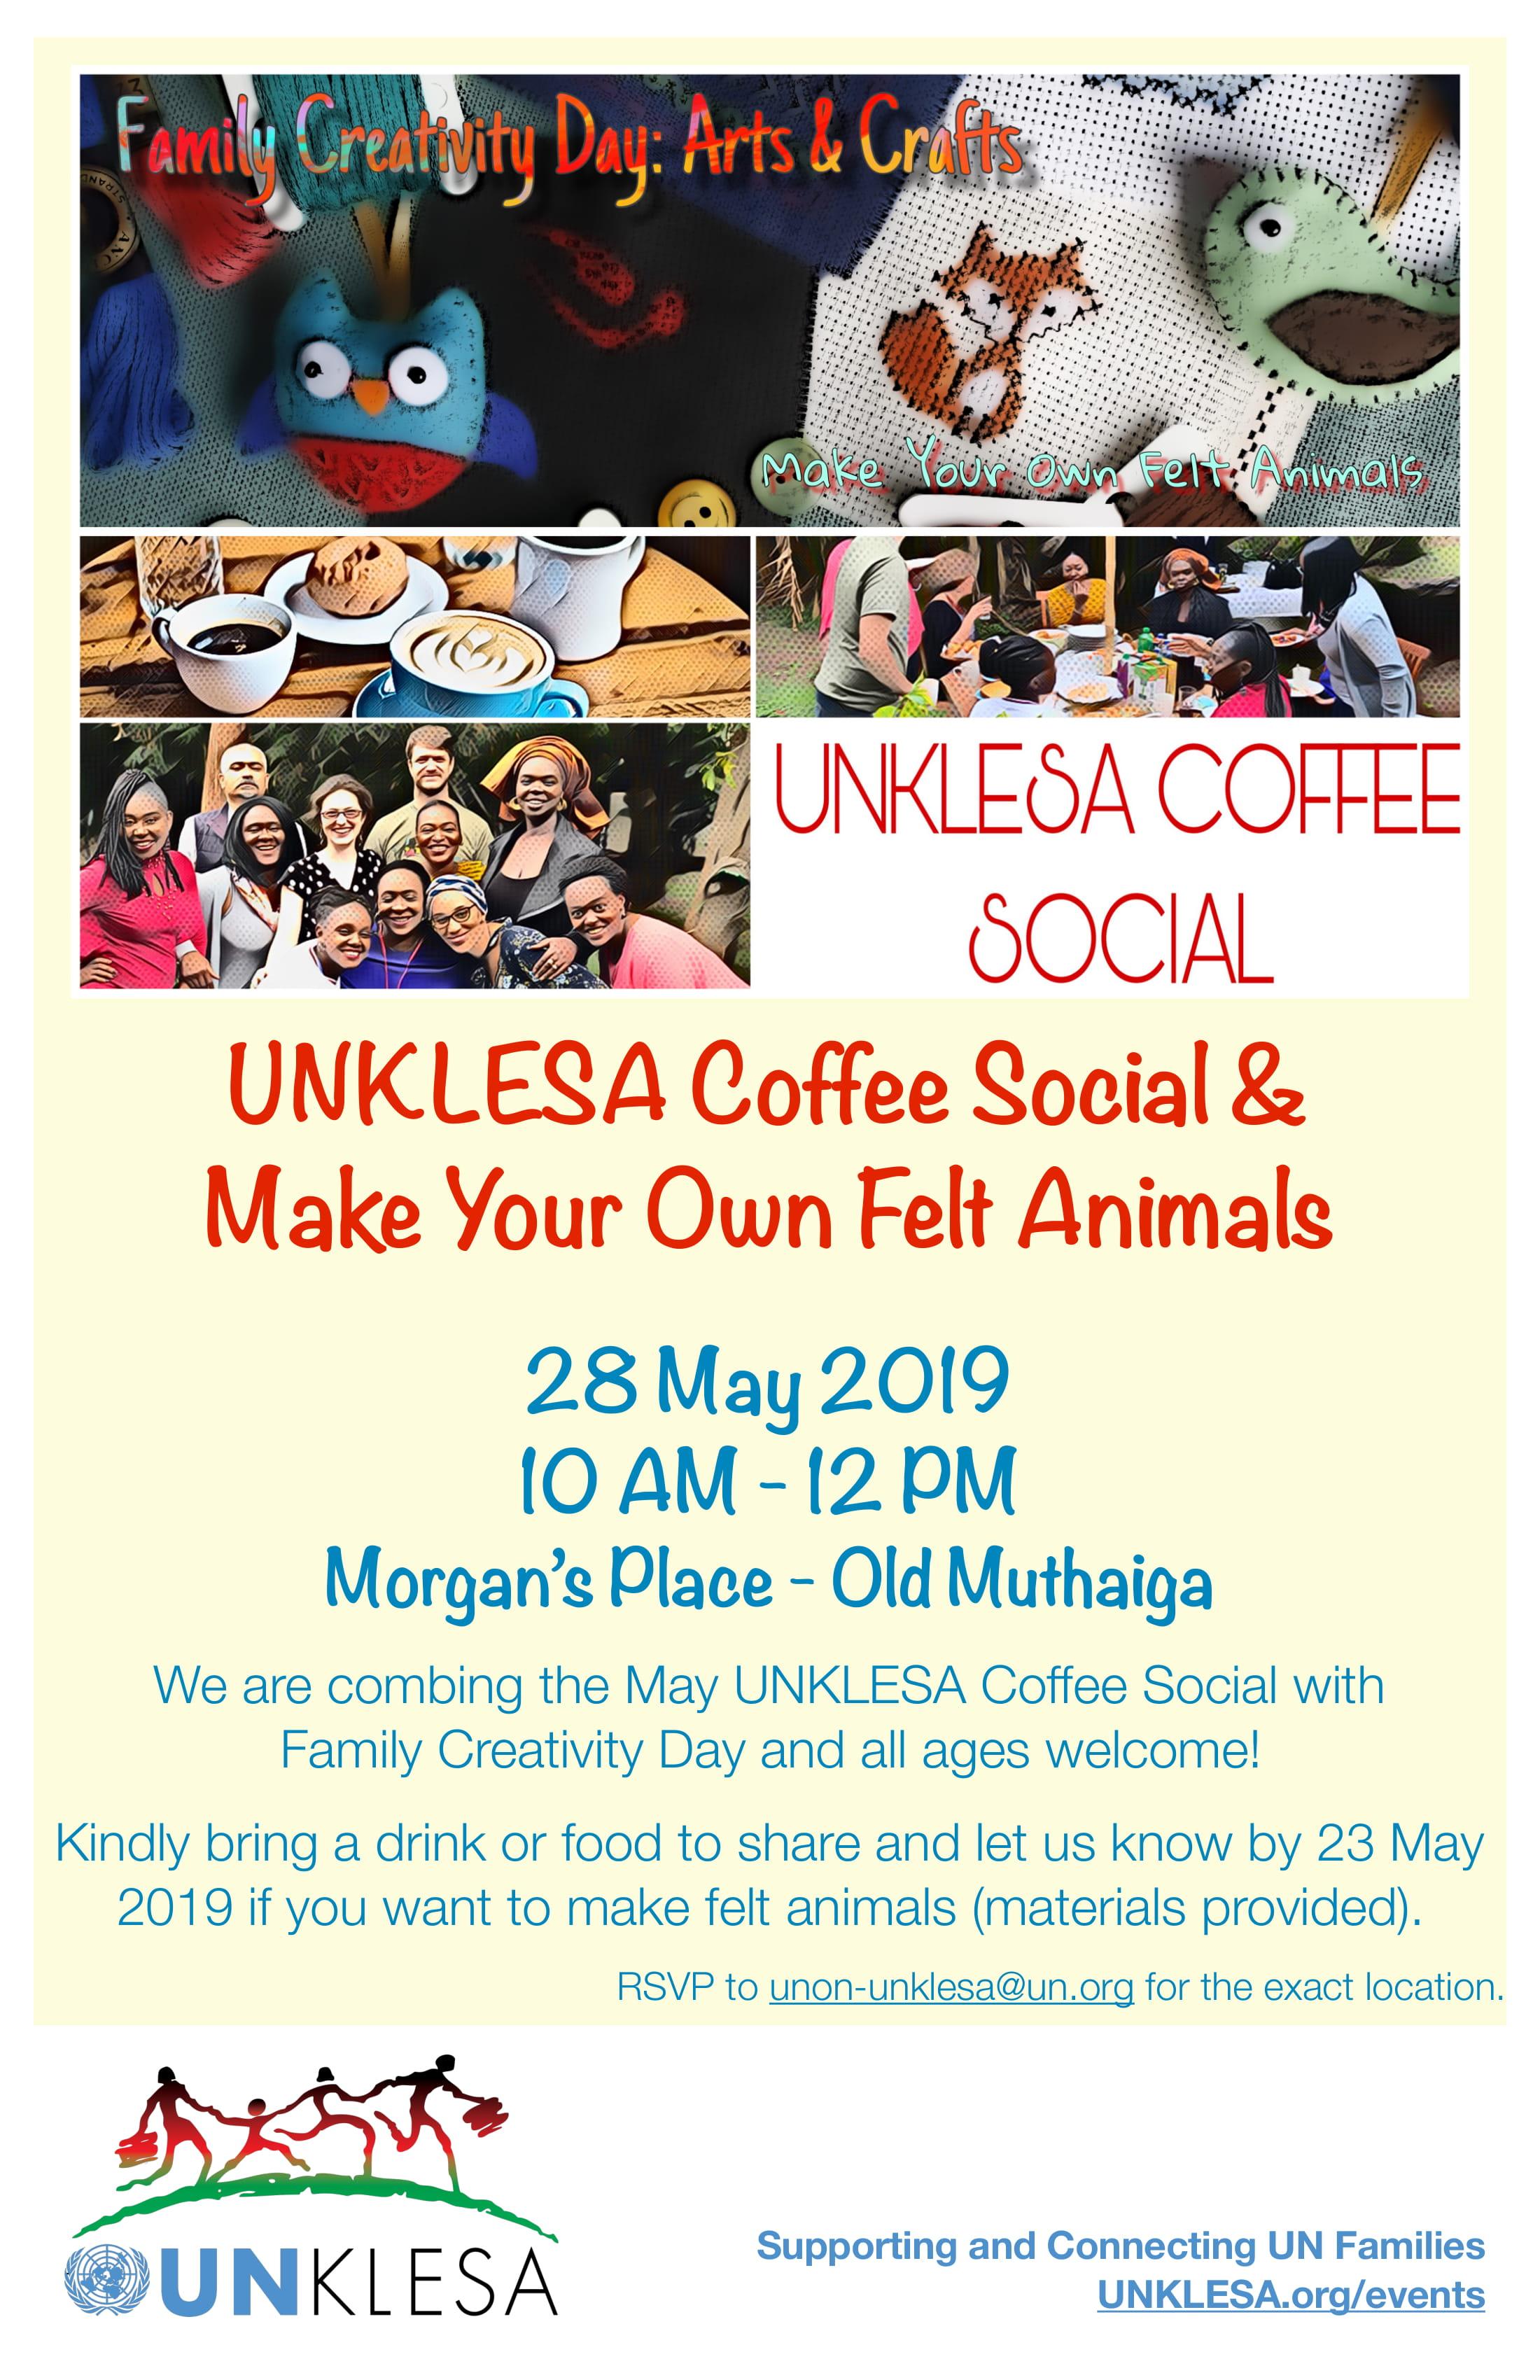 UNKLESA_CoffeeSocial&CraftsDay_2019_May28-1.jpg